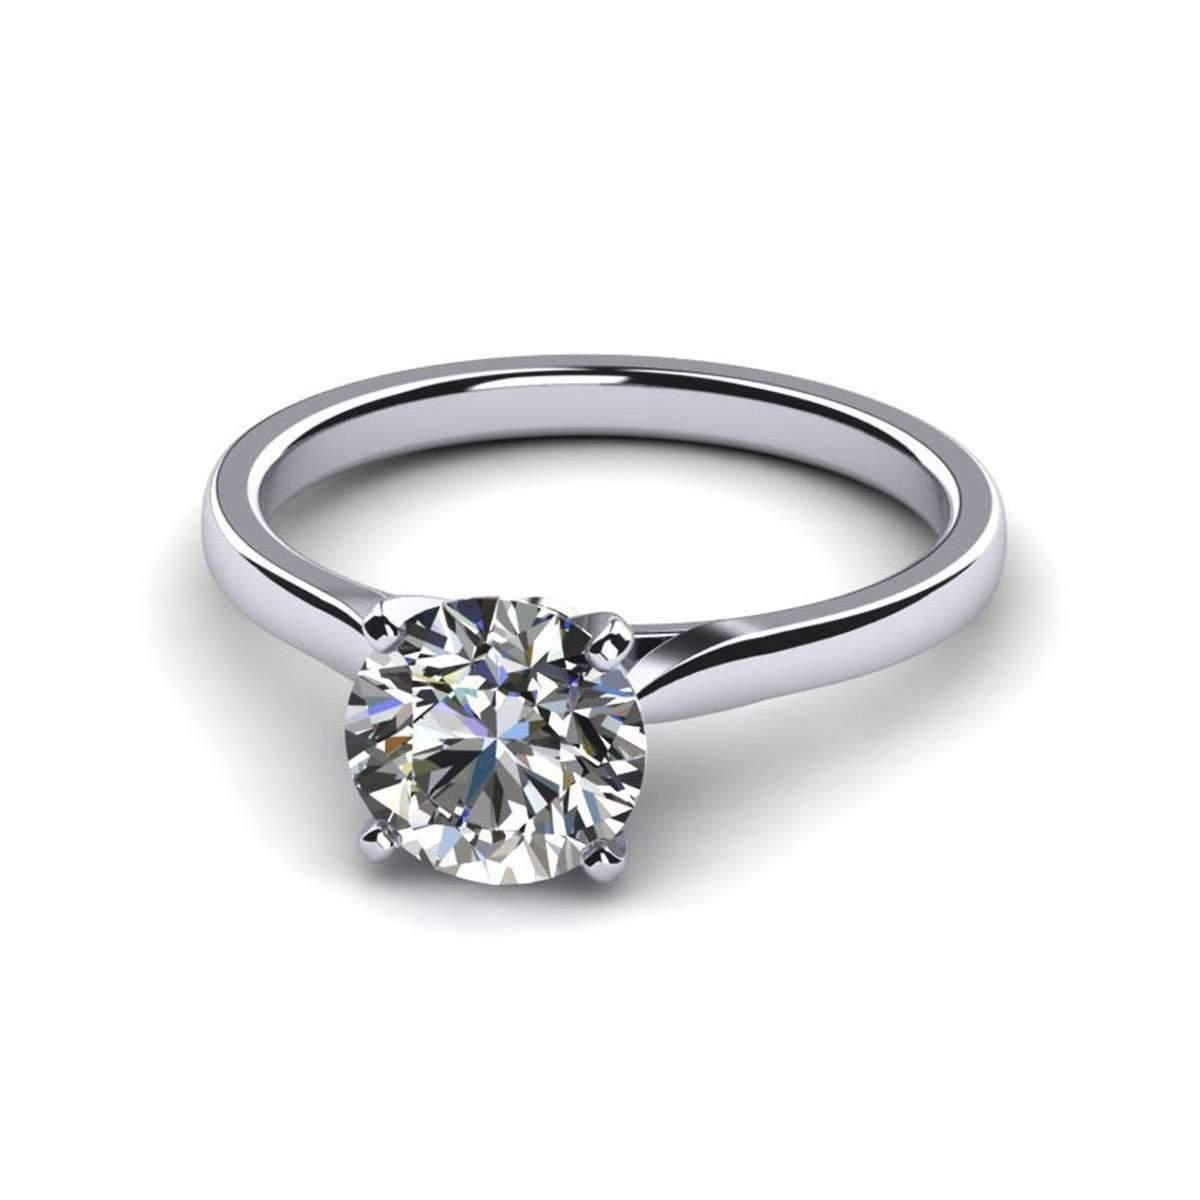 Diamoire Jewels White Round Cut Swarovski Zirconia Stud Earrings in 10Kt White Gold fRTYP